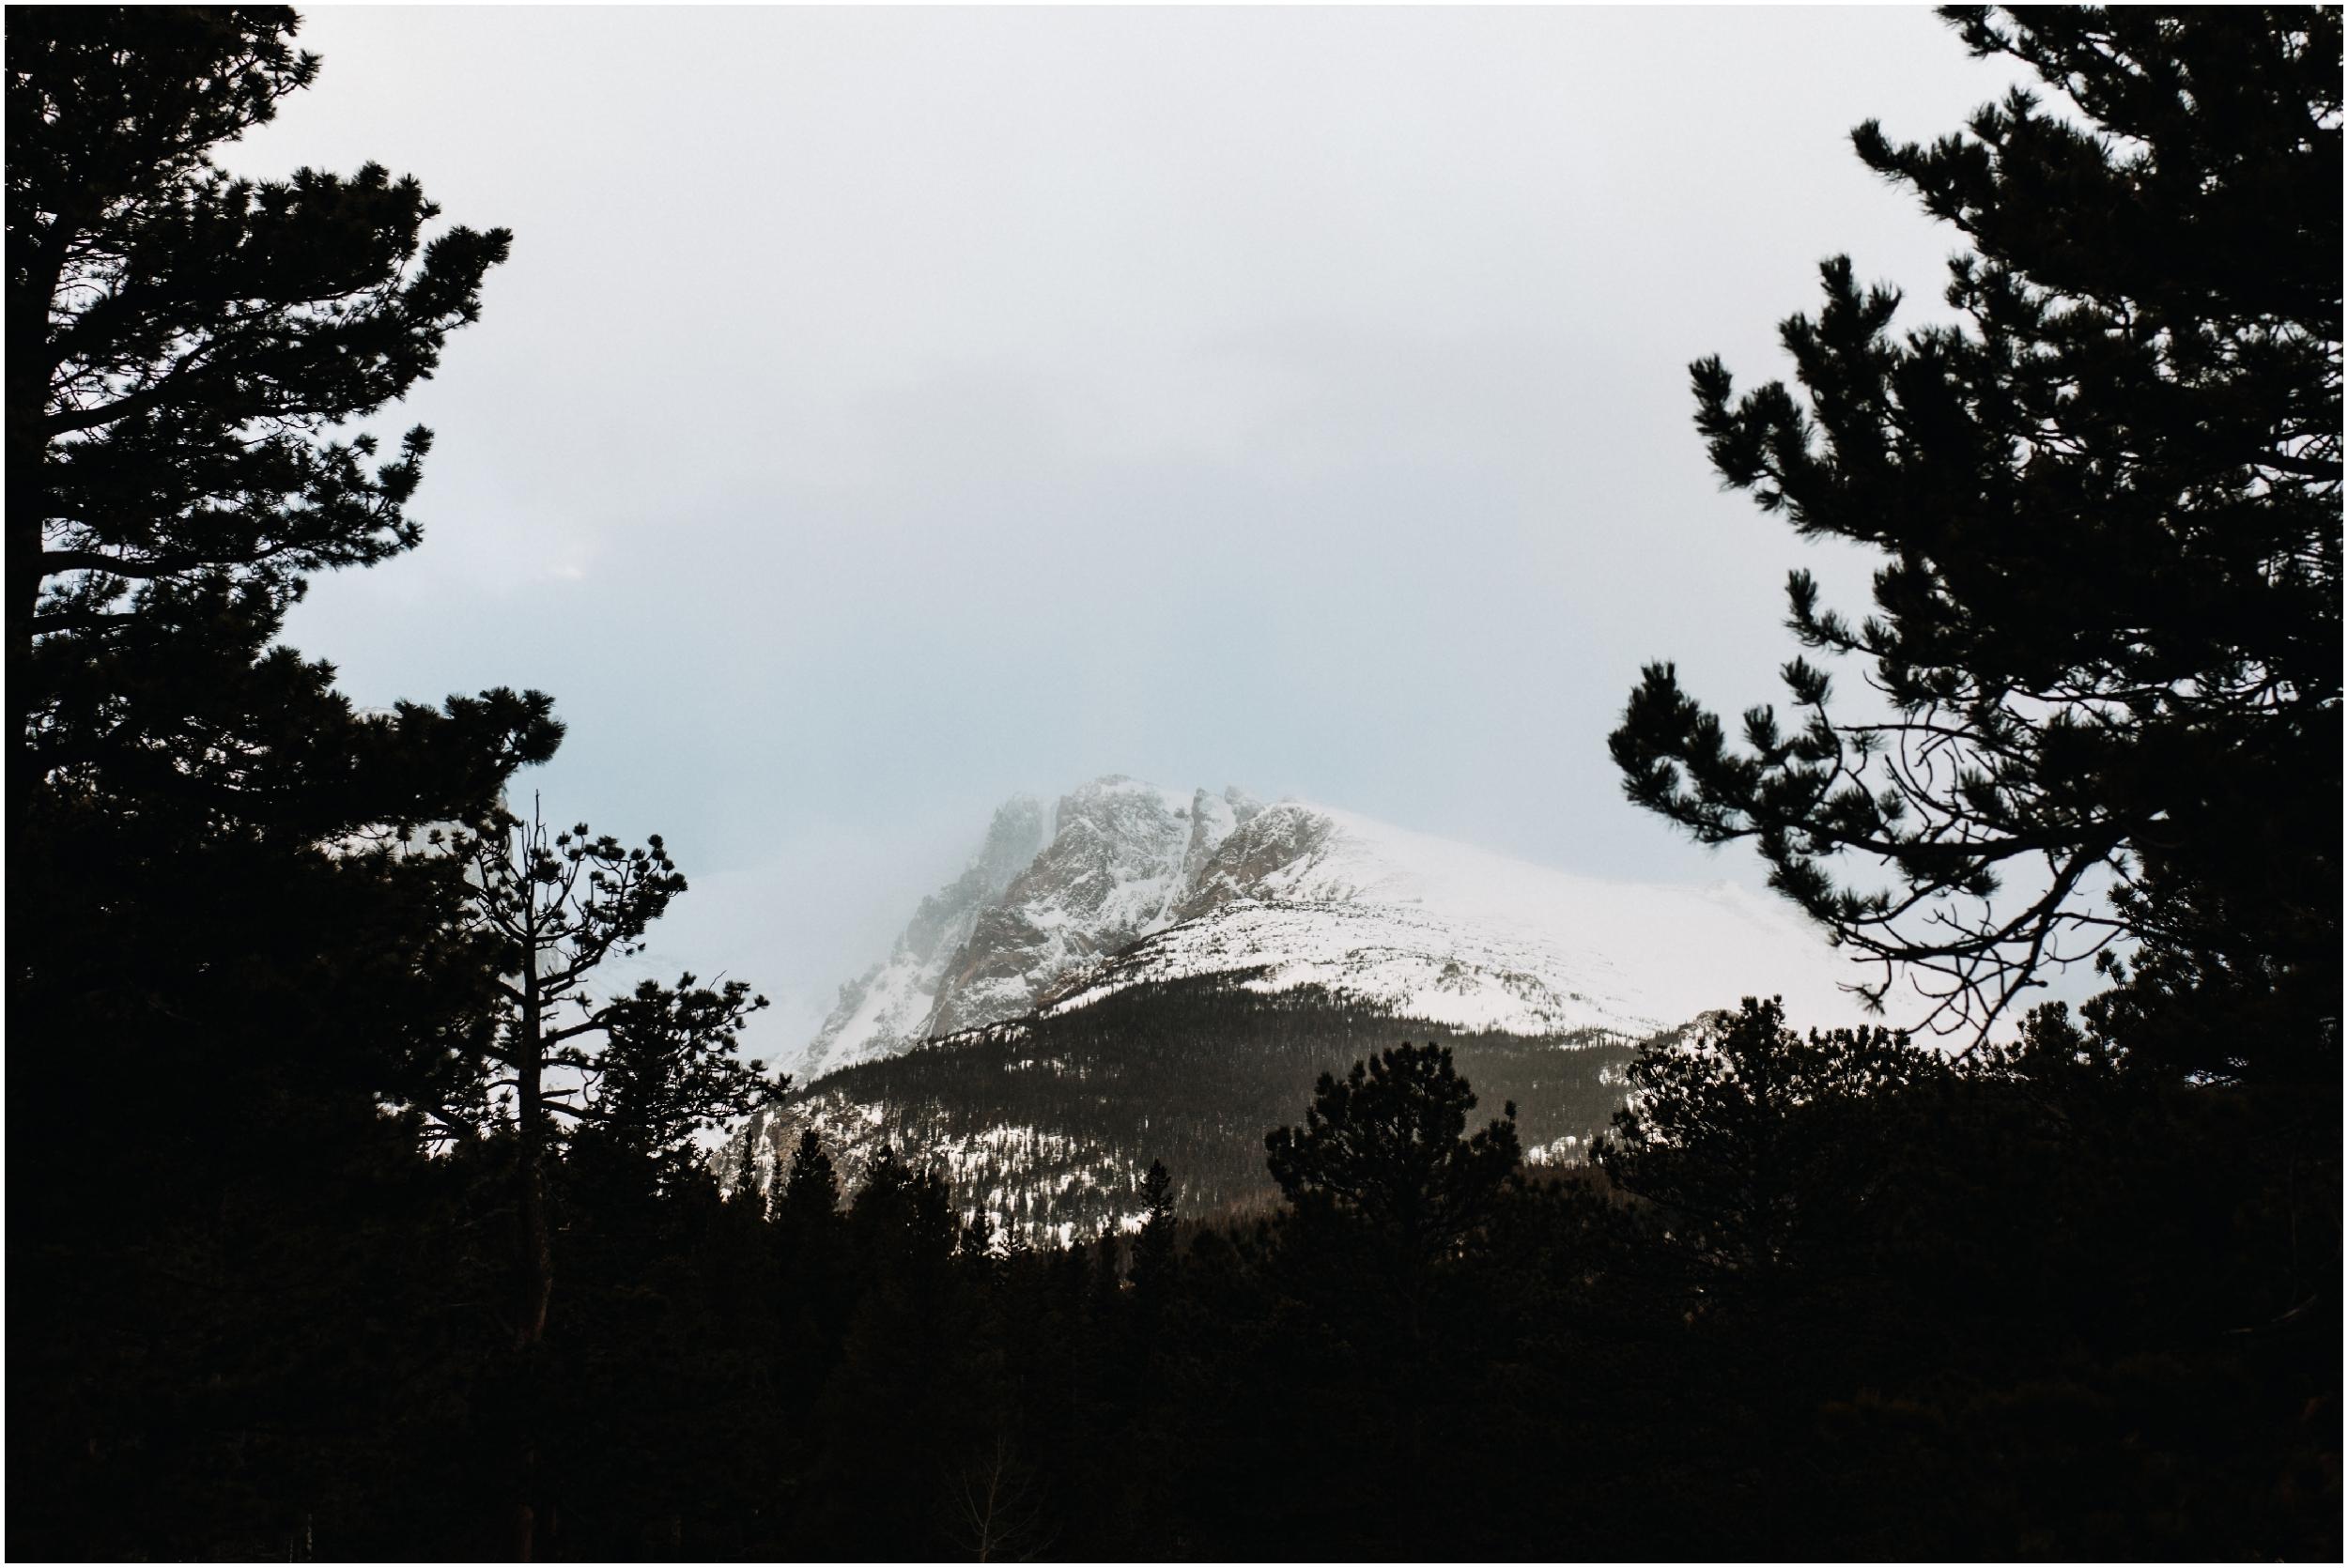 rocky-mountain-national-park-elopement-sprague-lake-colorado-adventure-wedding-photographer_taylor-powers_188.jpg